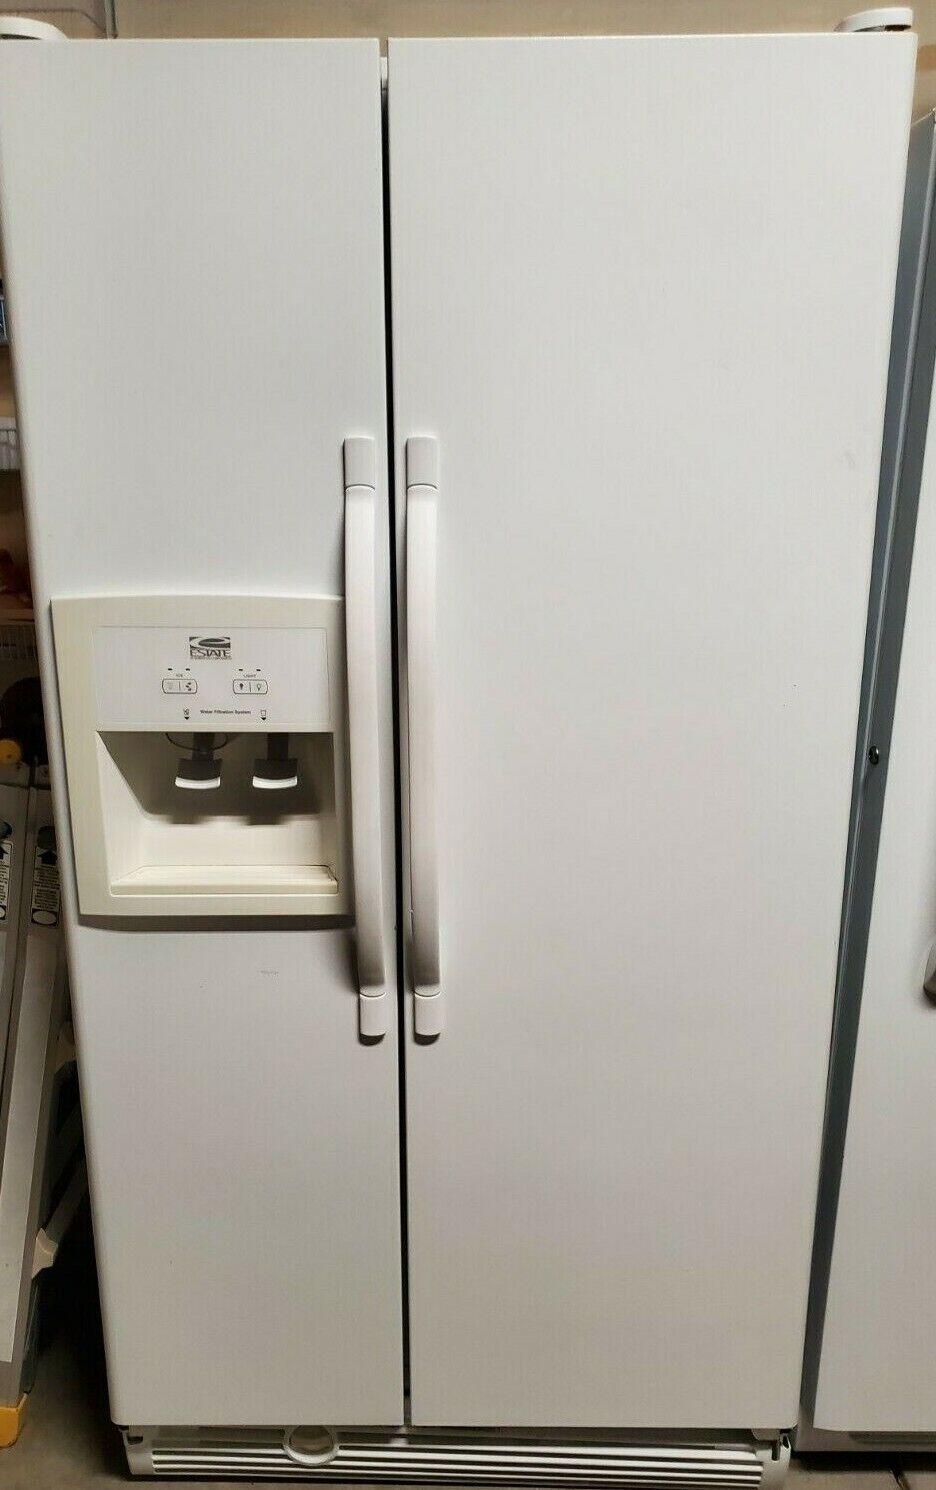 whirlpool refrigerator freezer 25 cu ft